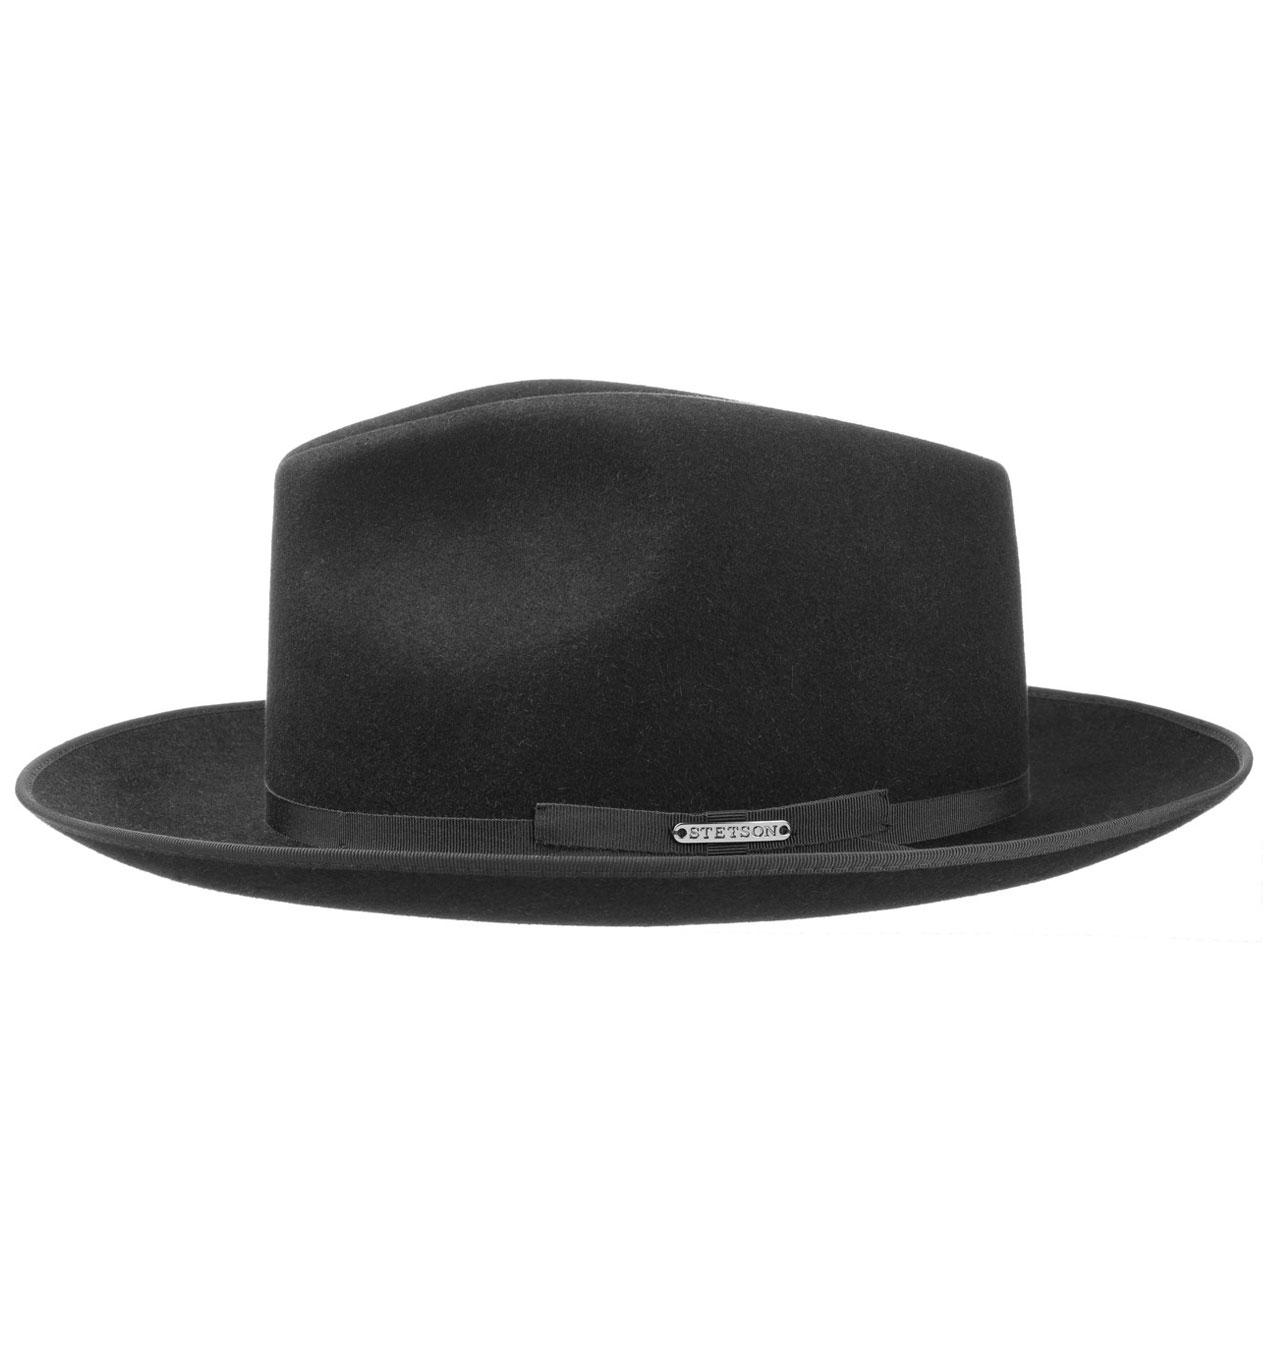 022733b9c Stetson - Stratoliner Fedora Fur Felt Hat - Black